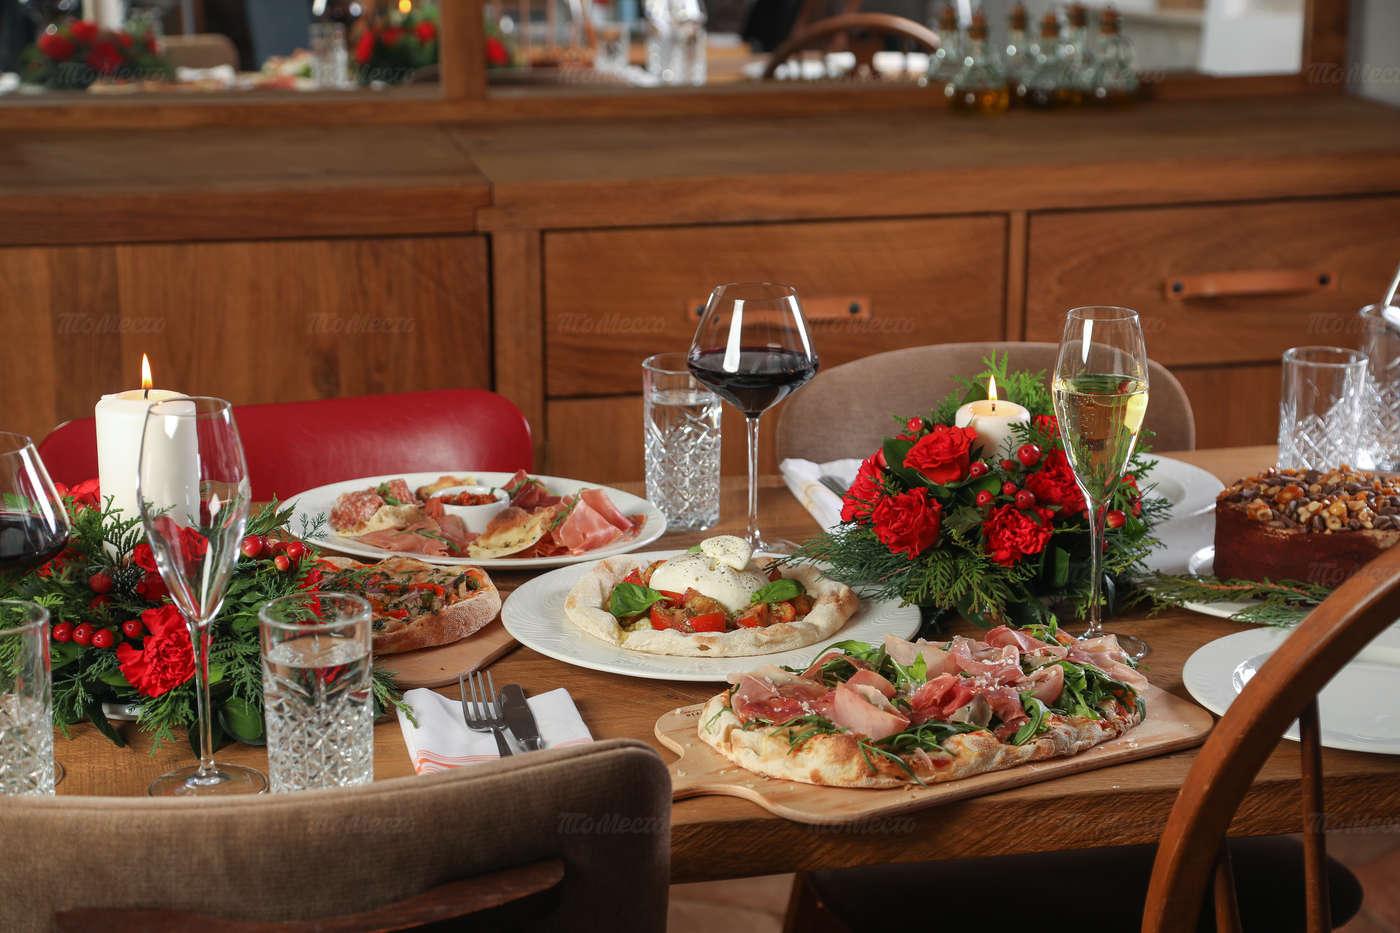 Меню ресторана Pinzeria by Bontempi (Пинцерия Бонтемпи) на Верх-Исетском бульваре фото 67